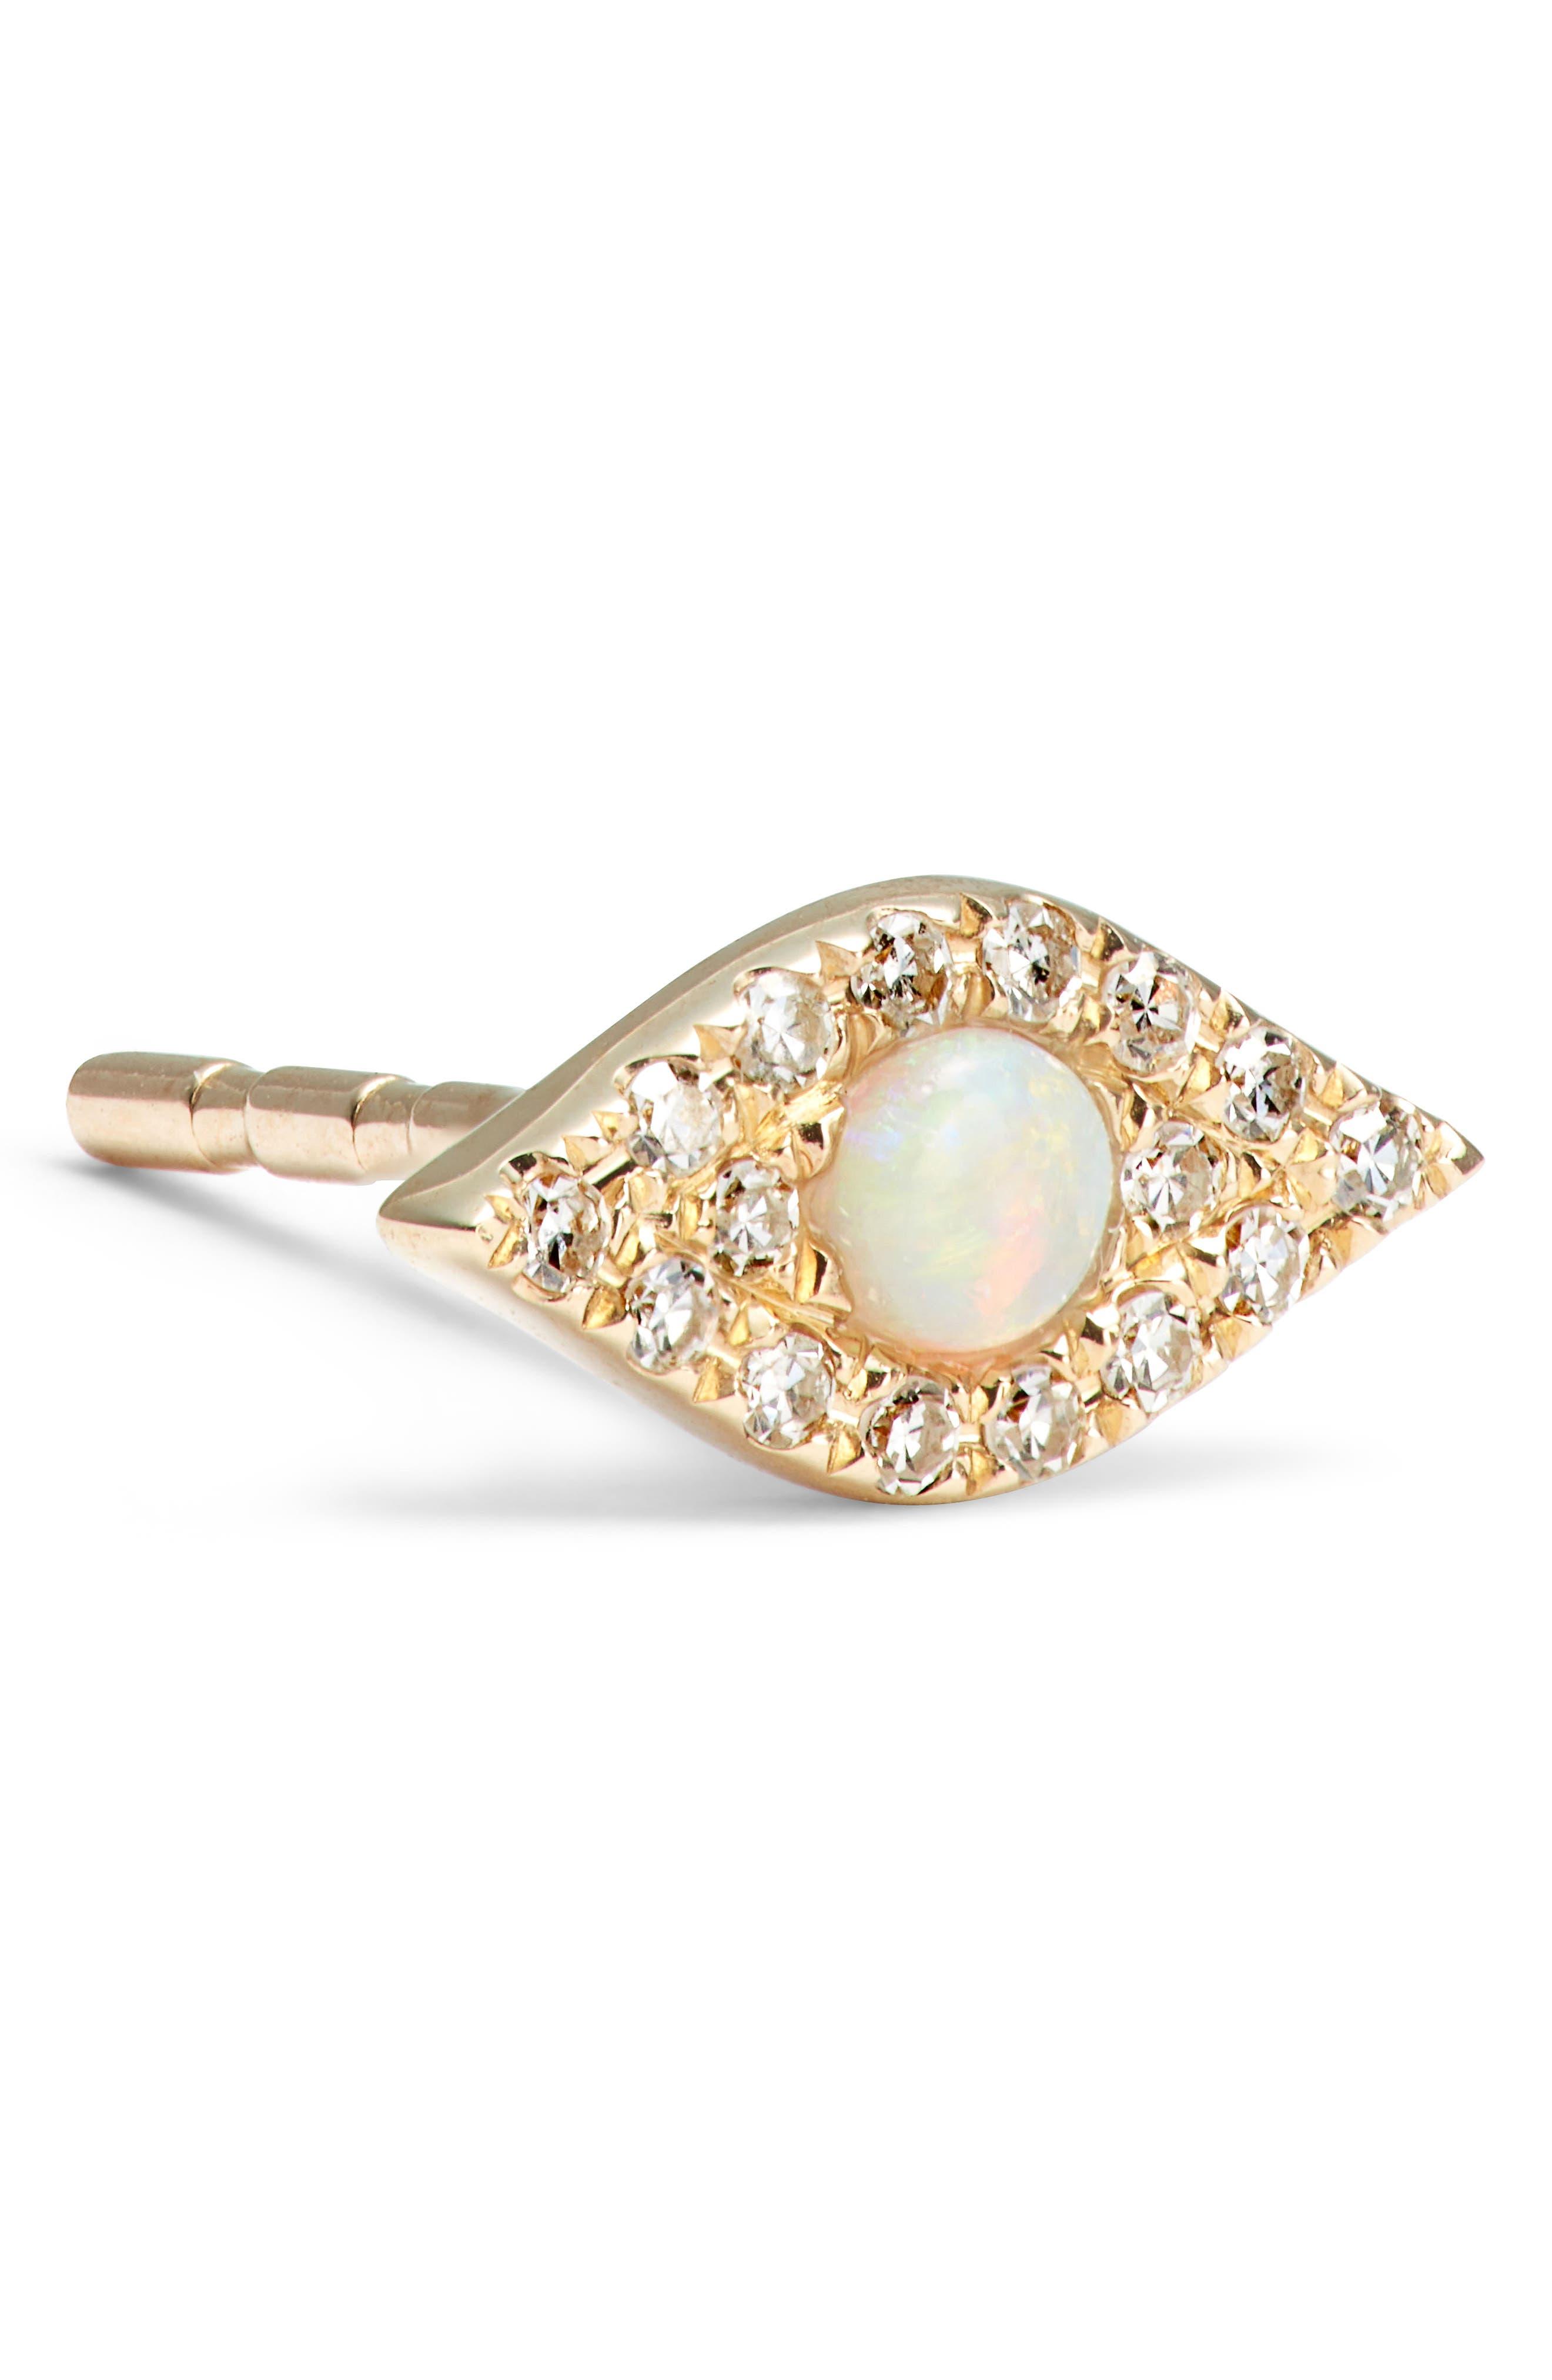 Evil Eye Diamond & Opal Stud Earrings,                             Alternate thumbnail 5, color,                             Yellow Gold/ Opal